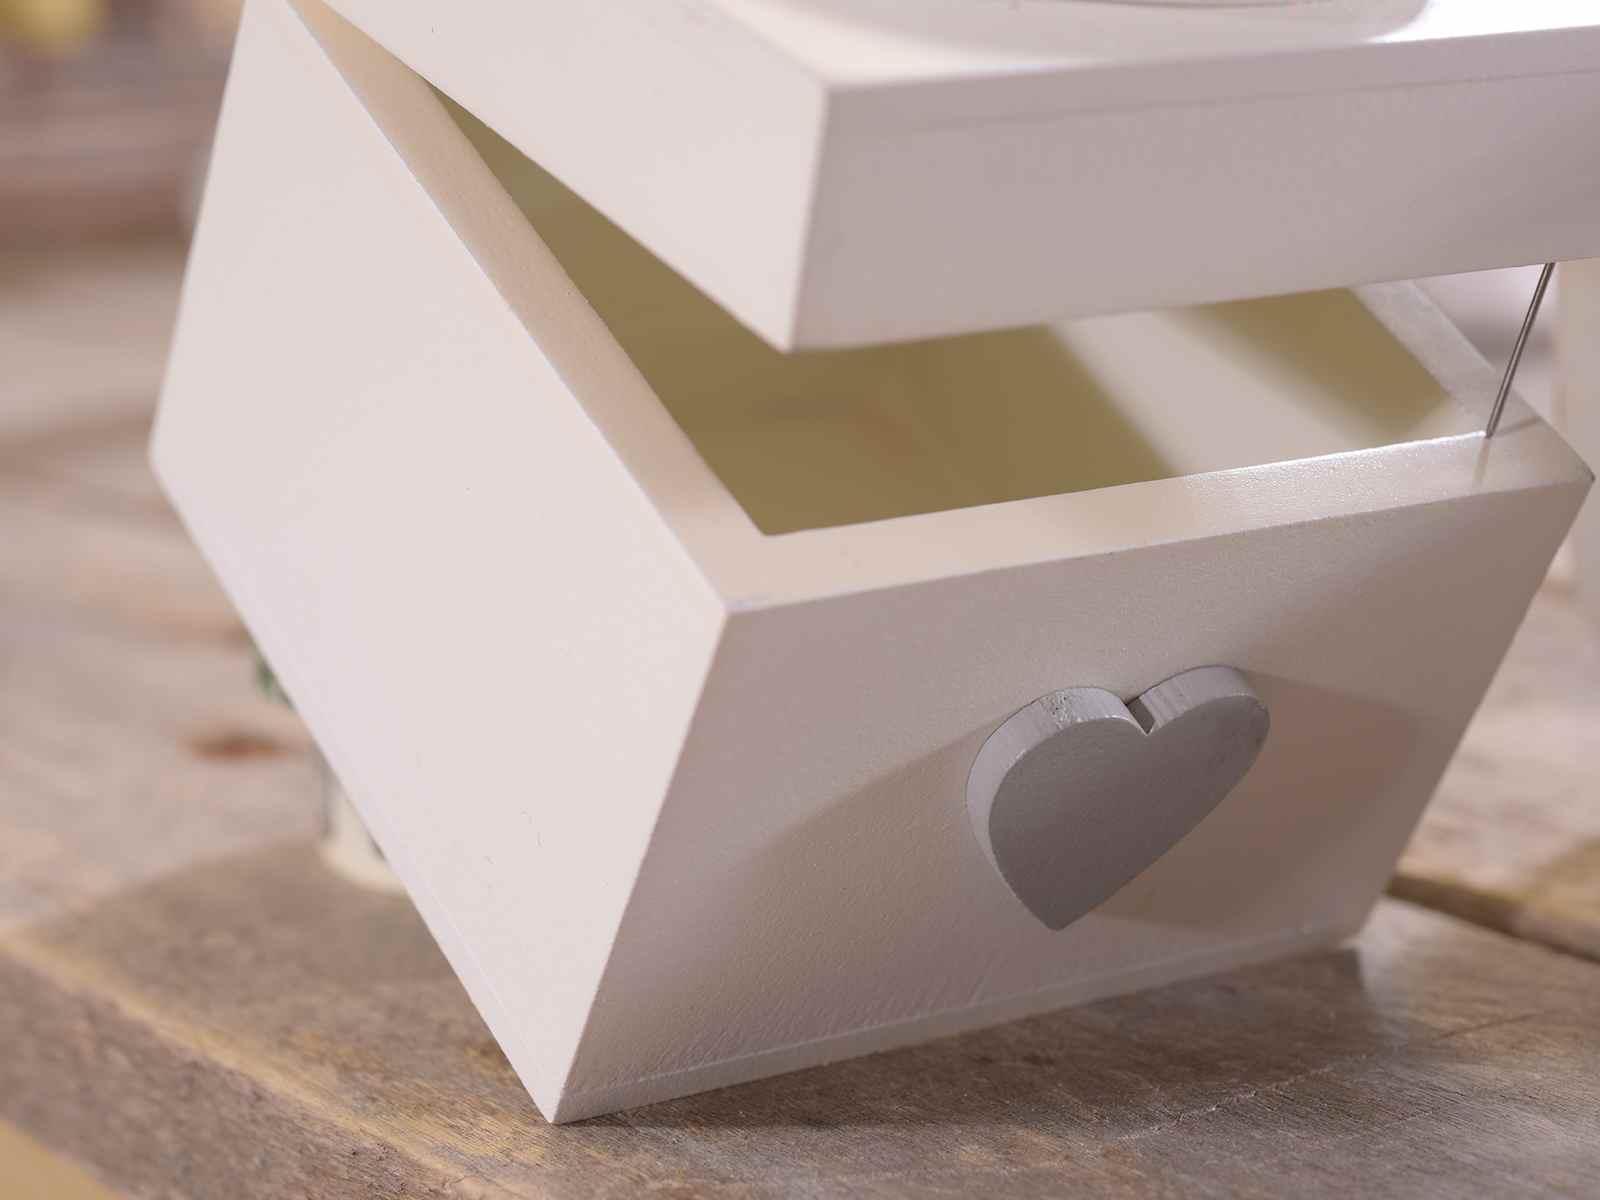 Caja de madera con tapa decorada con gallina - Cajas de vino de madera decoradas ...